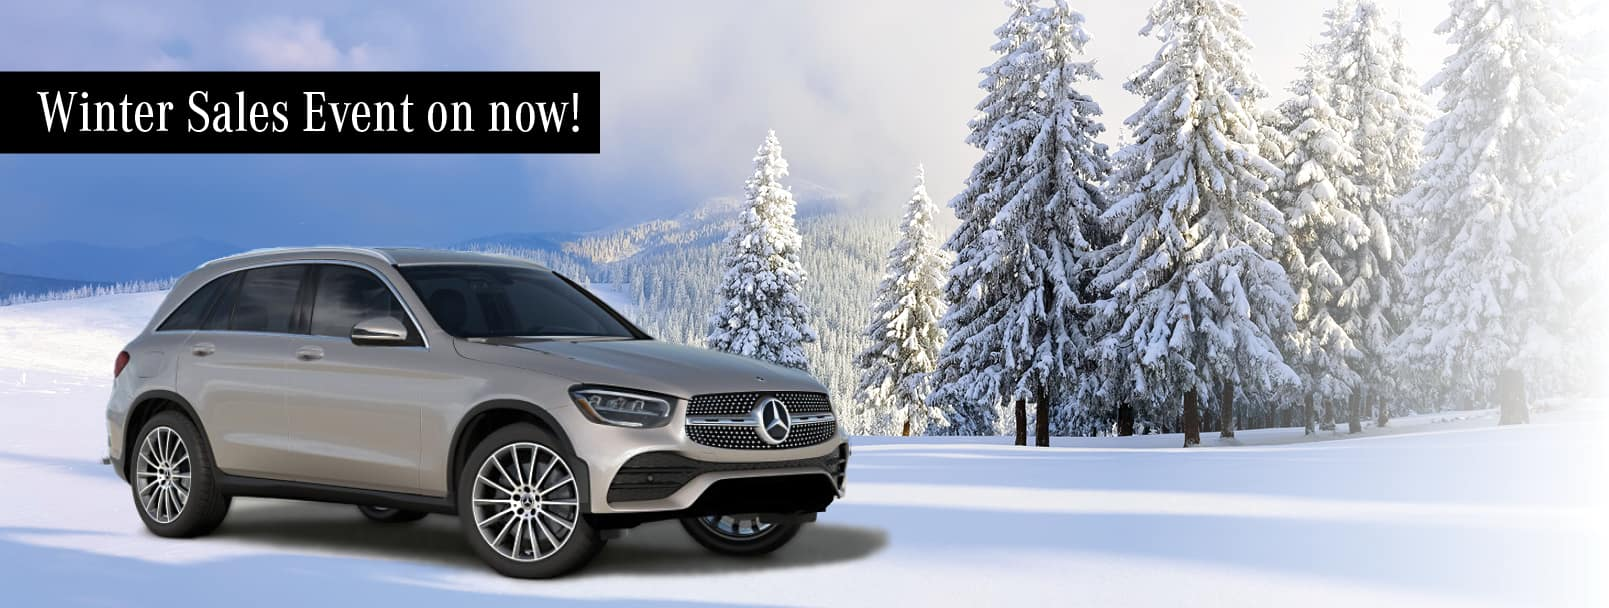 2020 Mercedes-Benz GLC Winter Sales Event